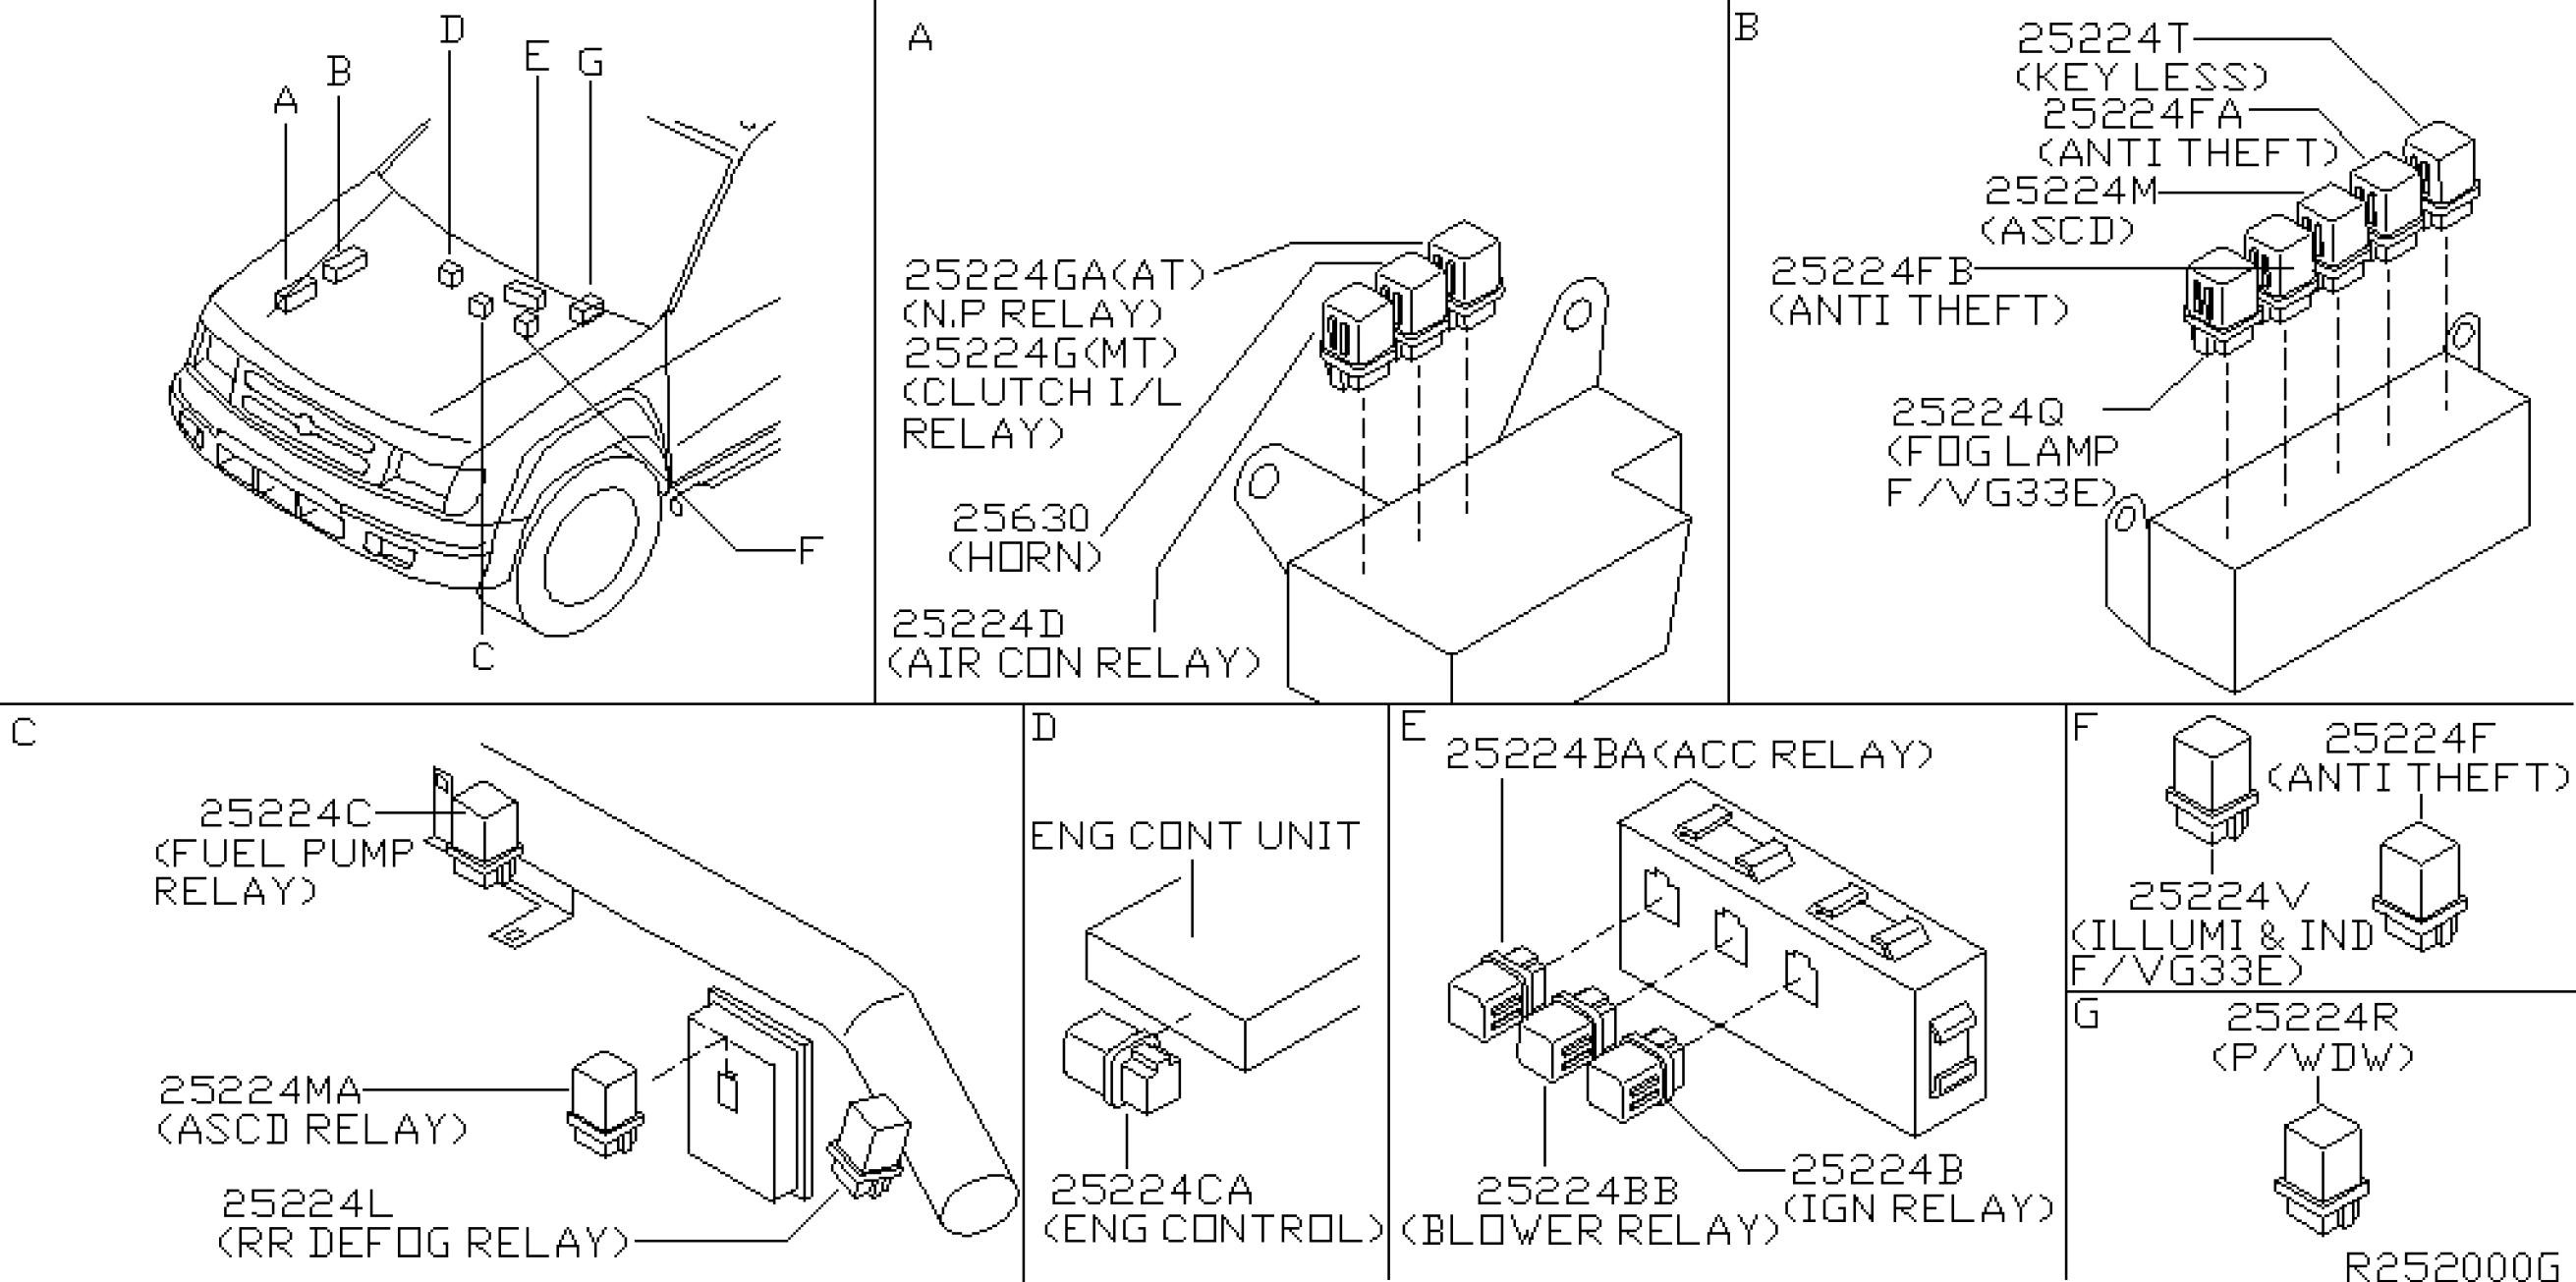 97 Ford Aspire Engine Diagram. Ford. Auto Wiring Diagram